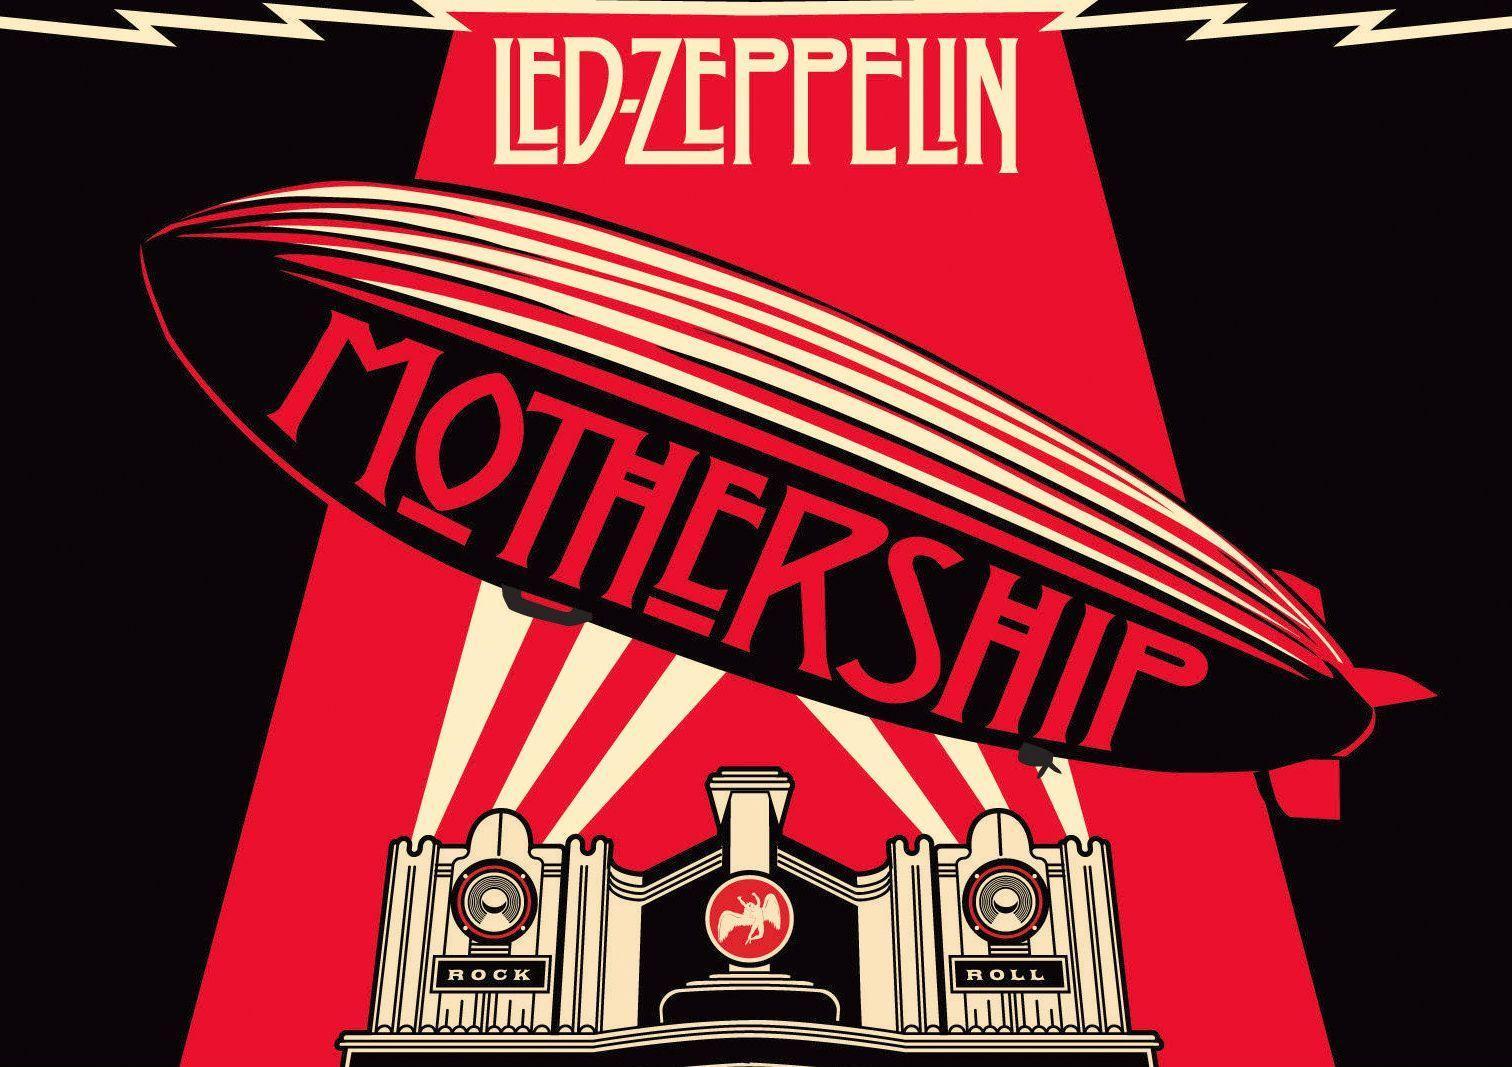 Led Zeppelin Backgrounds